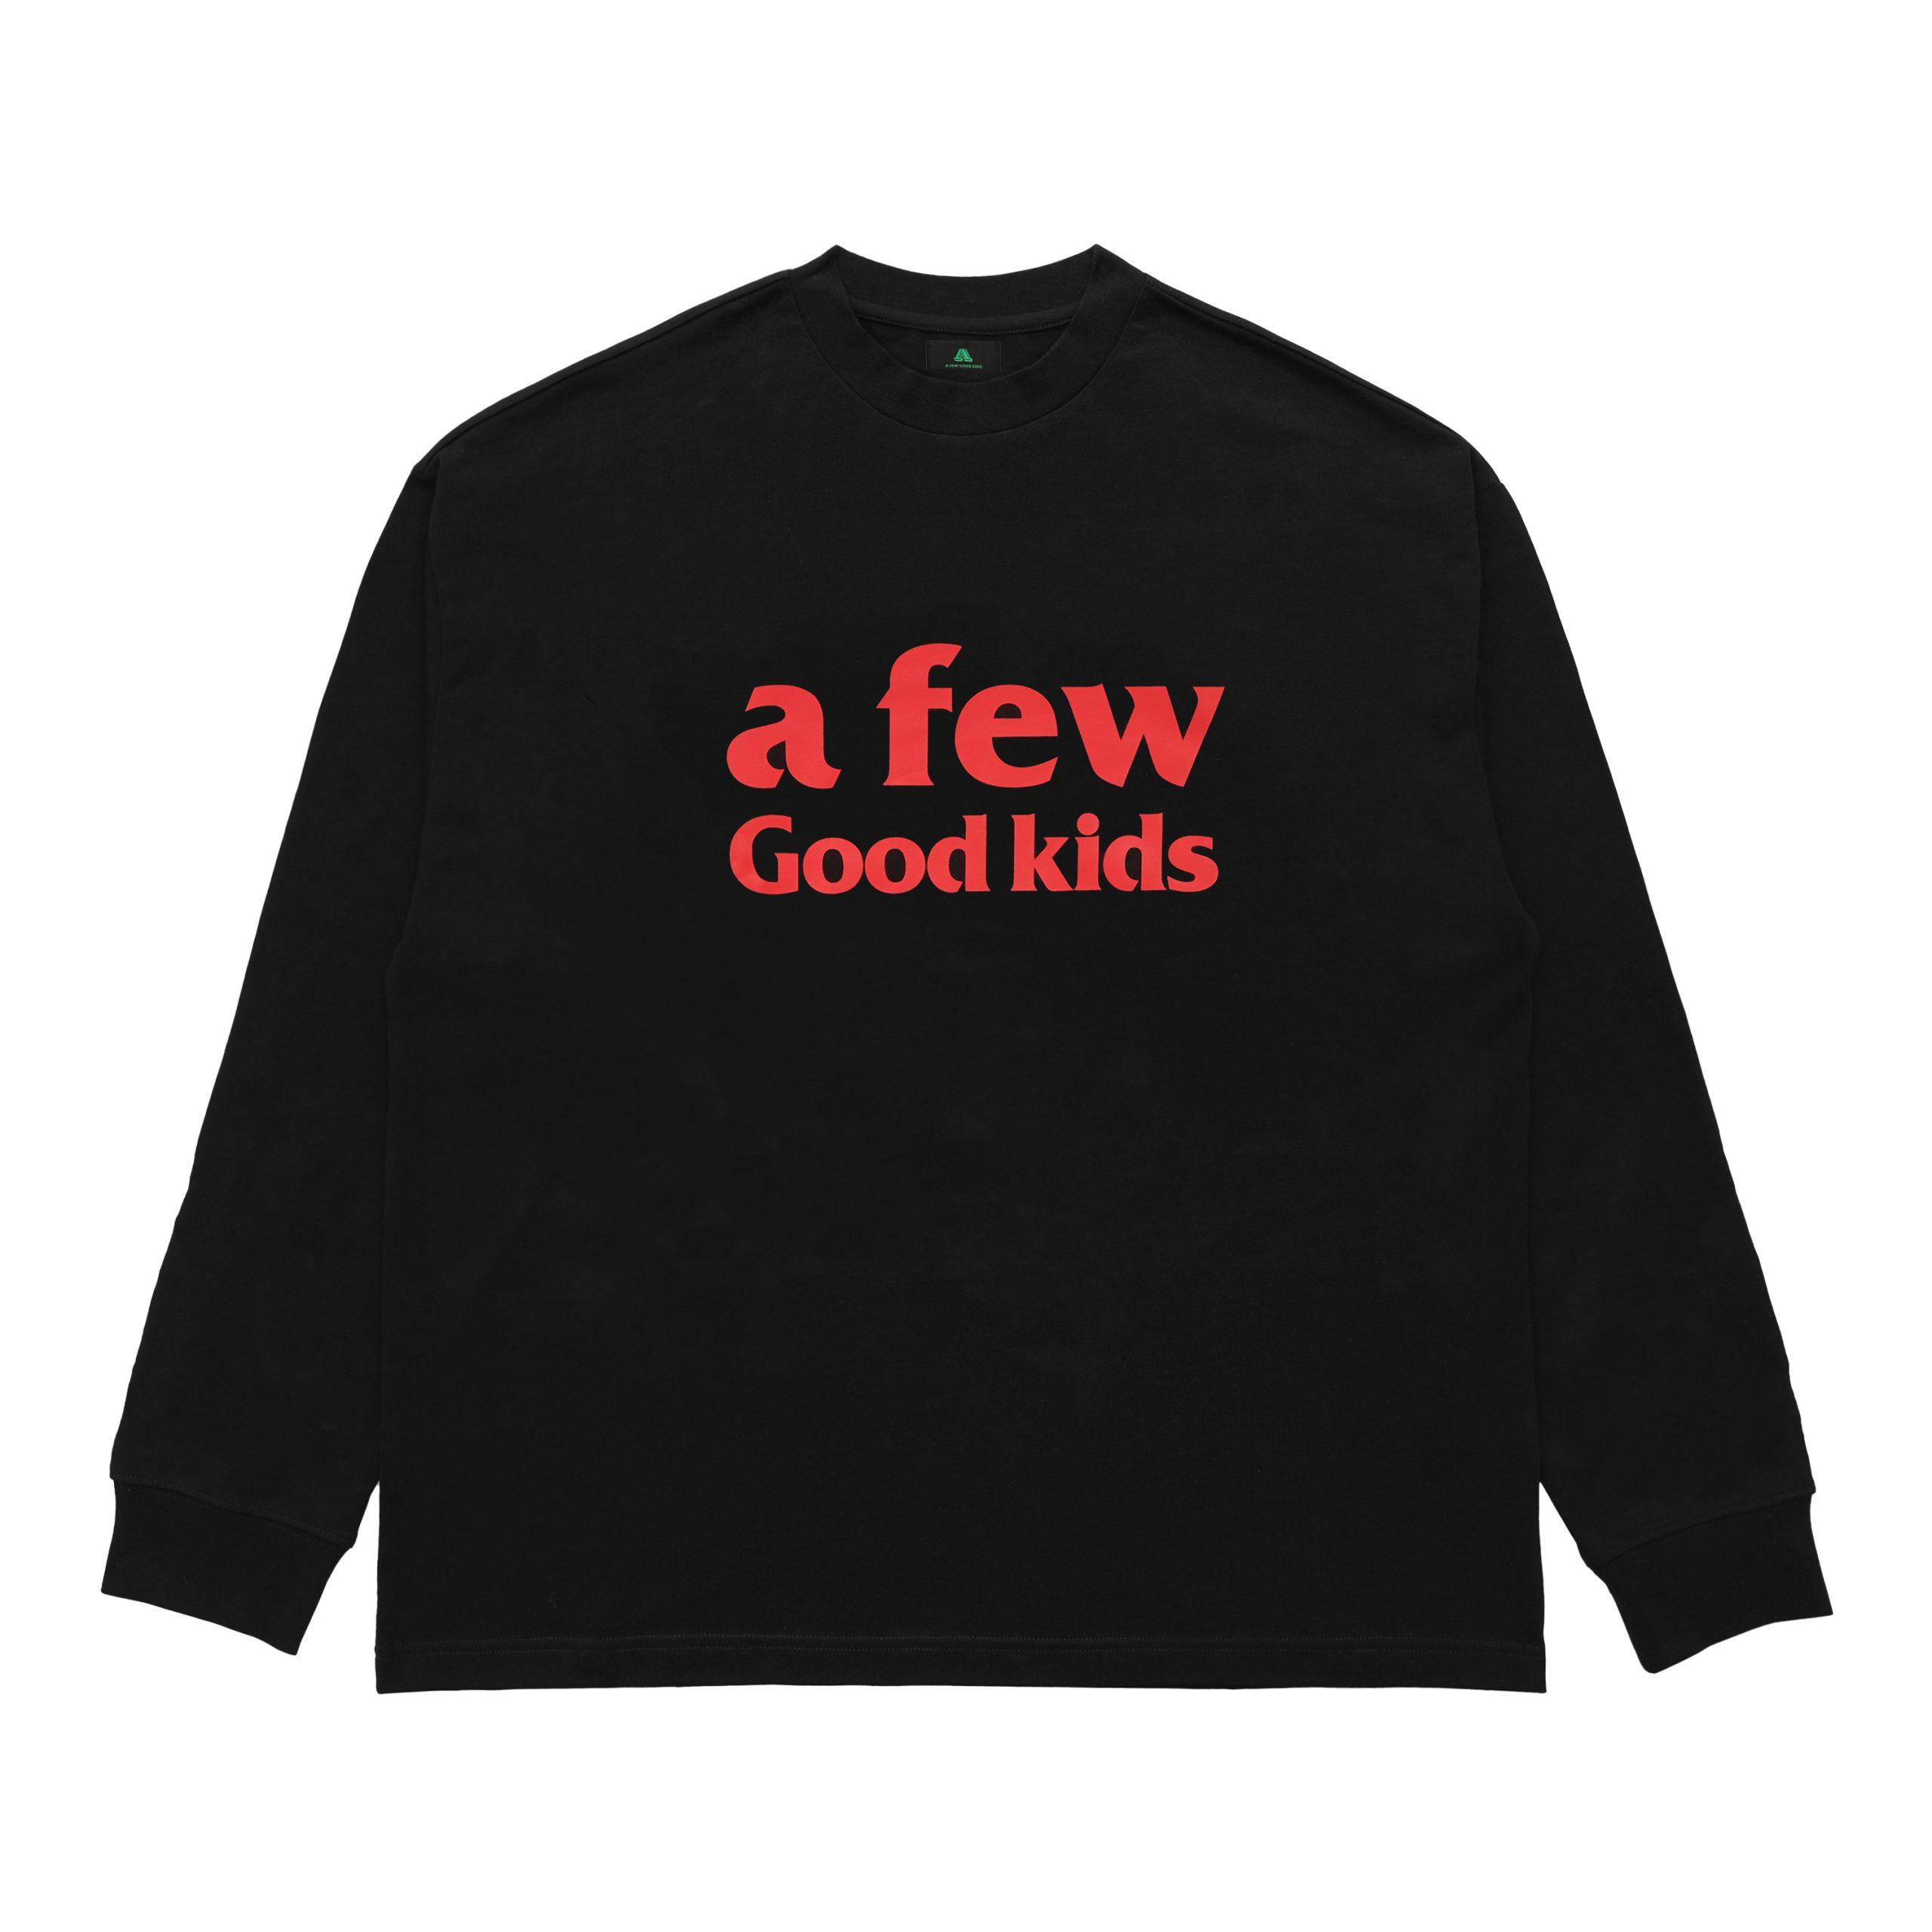 AFGK A Few Good Kids Long Sleeved Black Logo T-Shirt